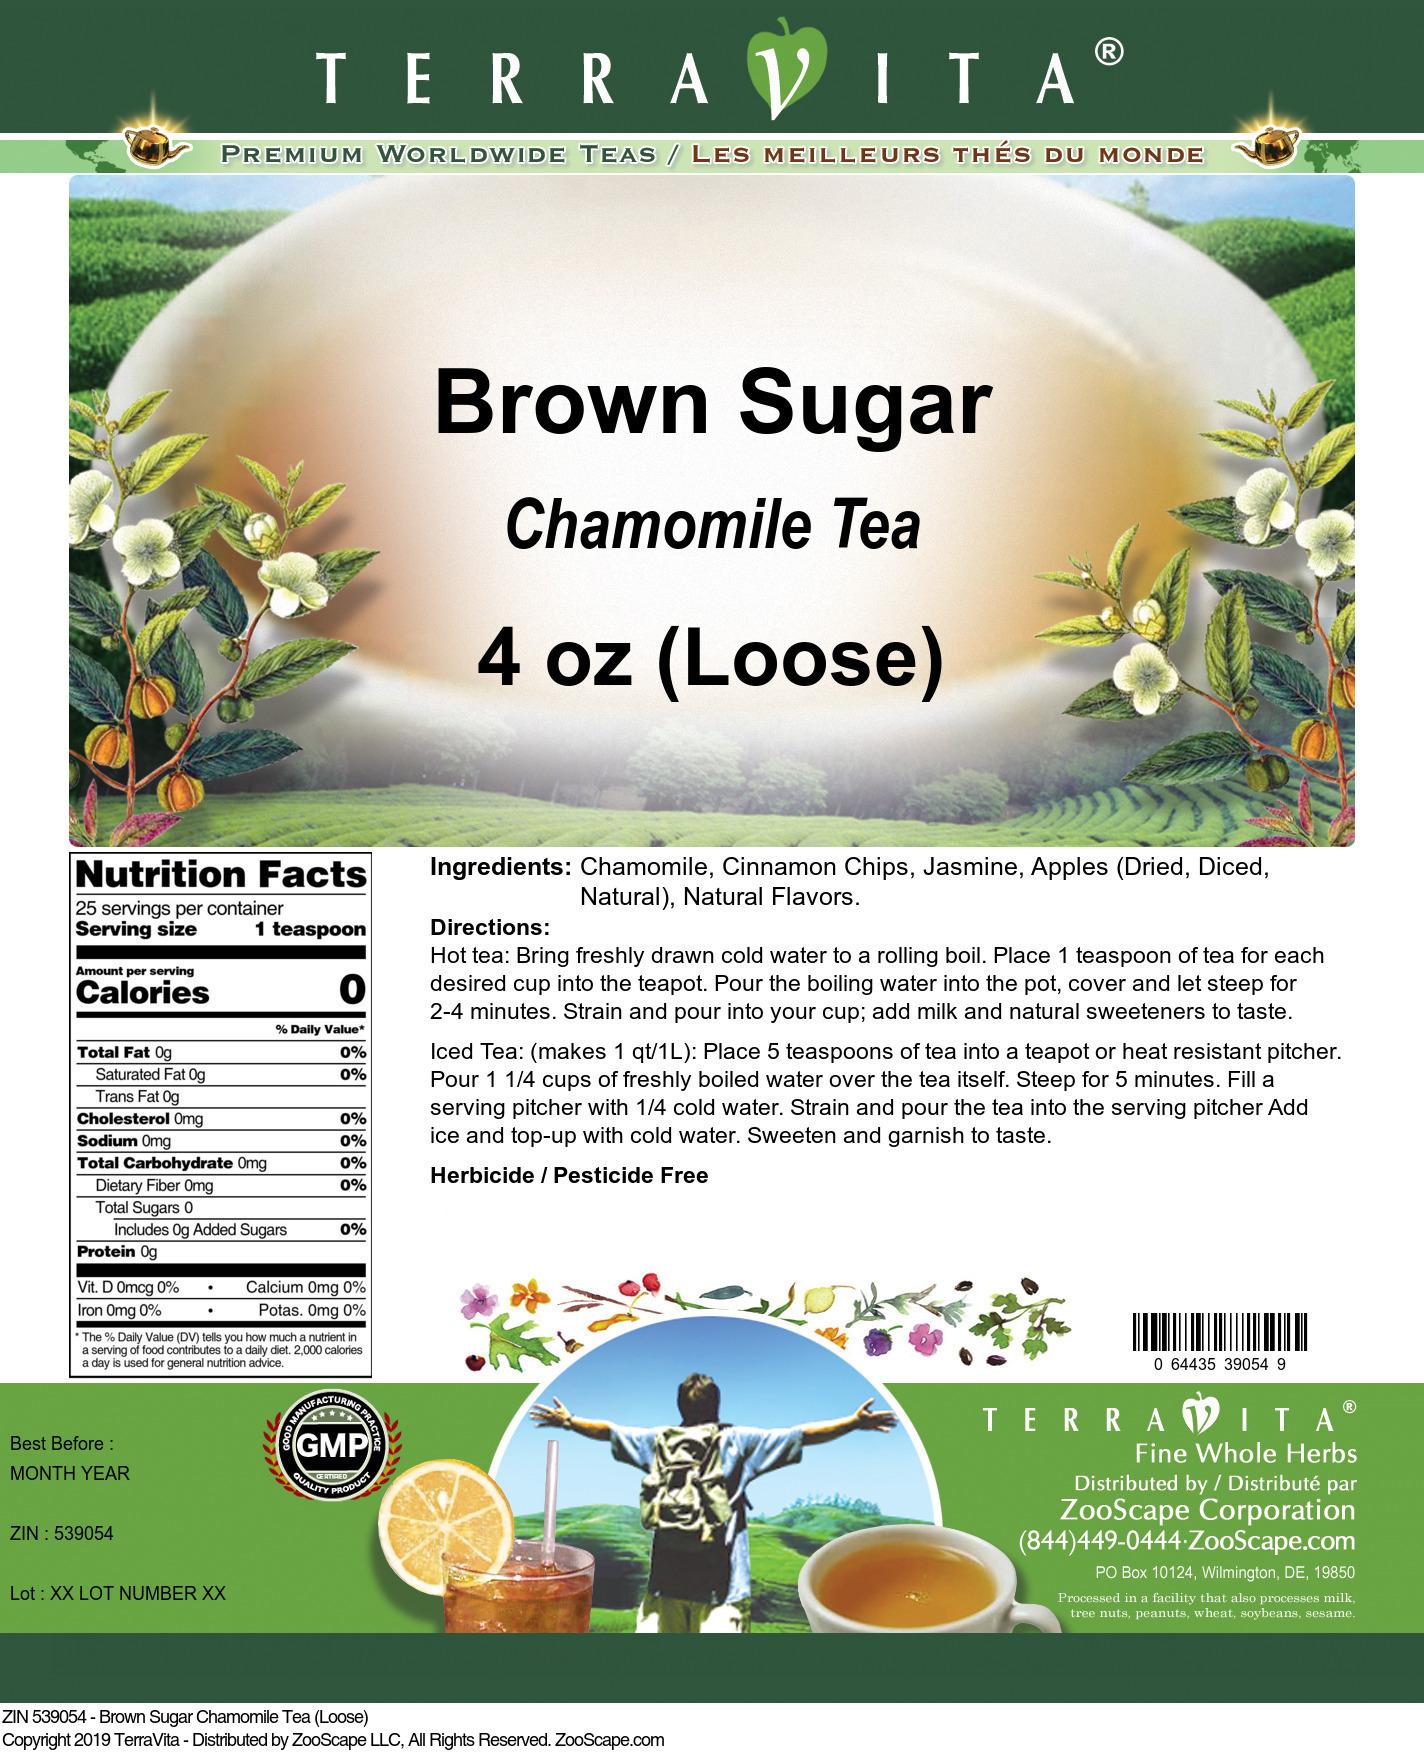 Brown Sugar Chamomile Tea (Loose)